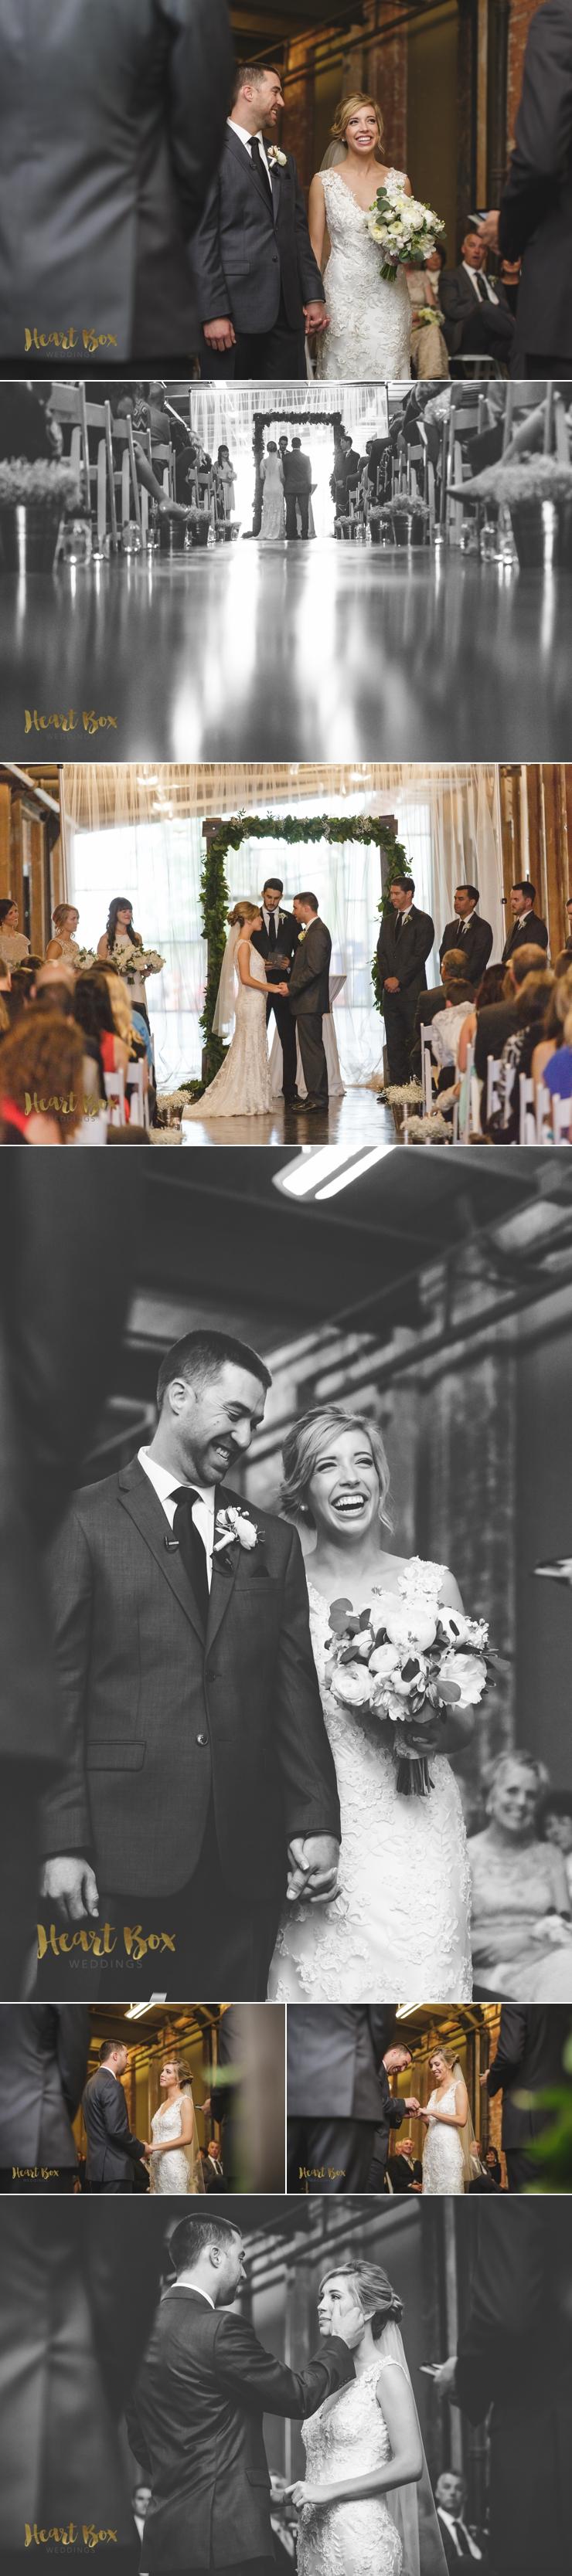 Popplewell Wedding Blog Collages 19.jpg